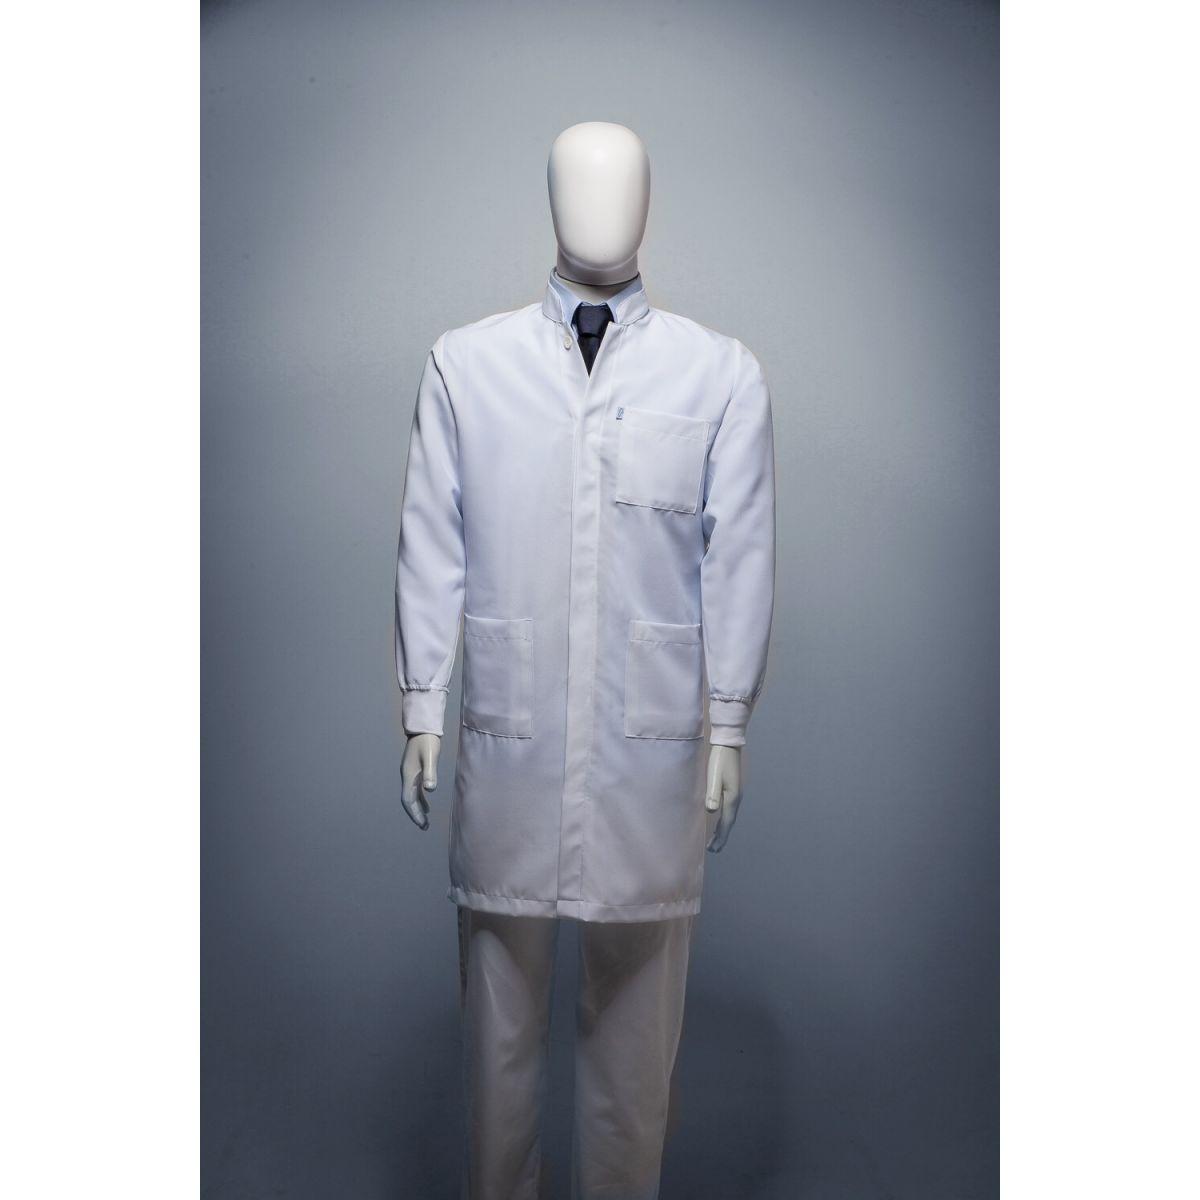 Jaleco Gola de Padre (punho de camisa) Microfibra Elegant